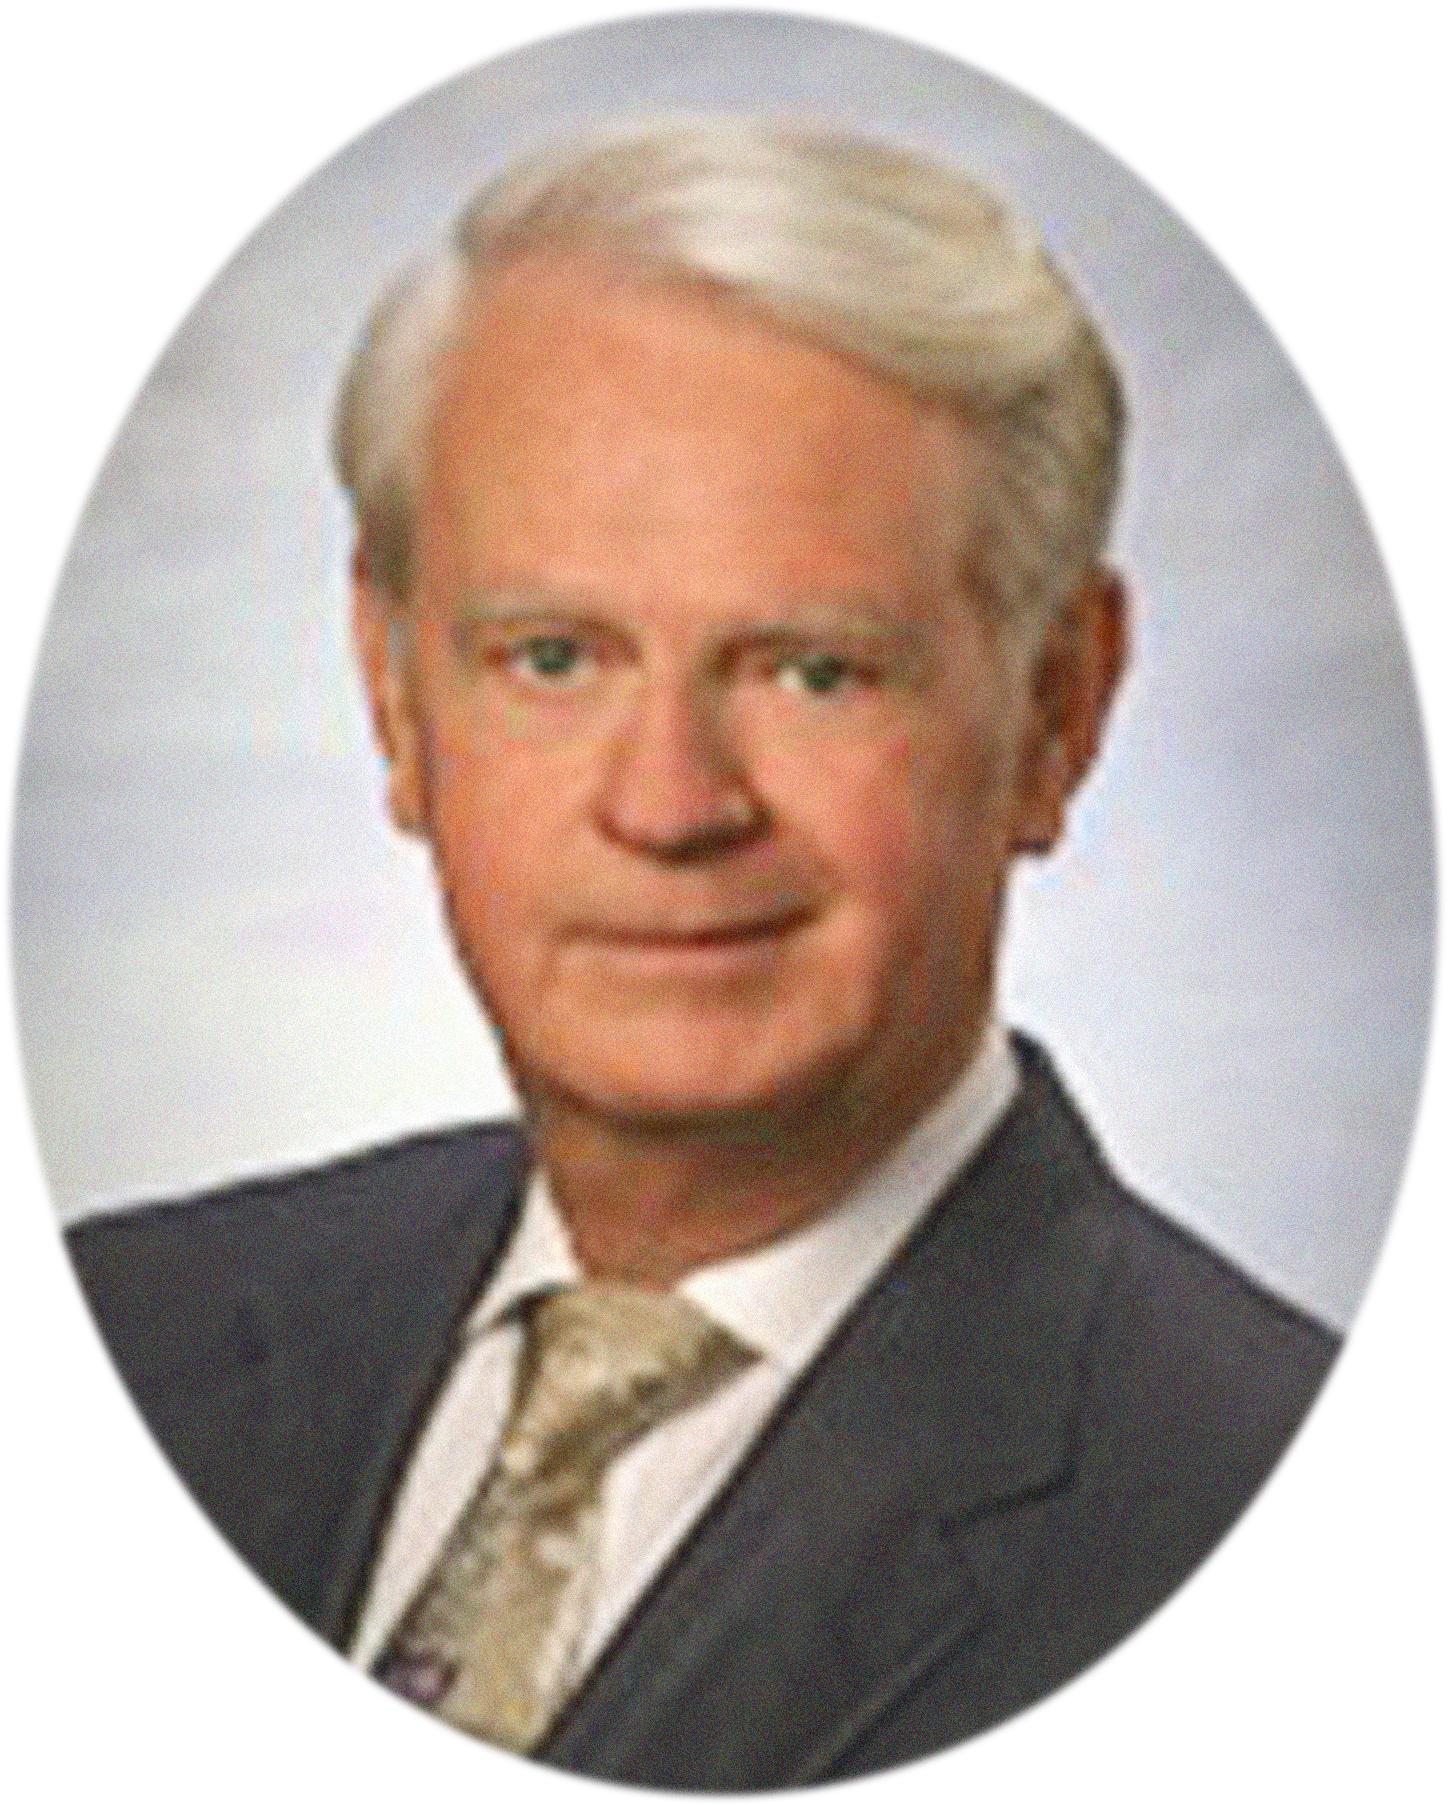 Glen Albert Sandoz